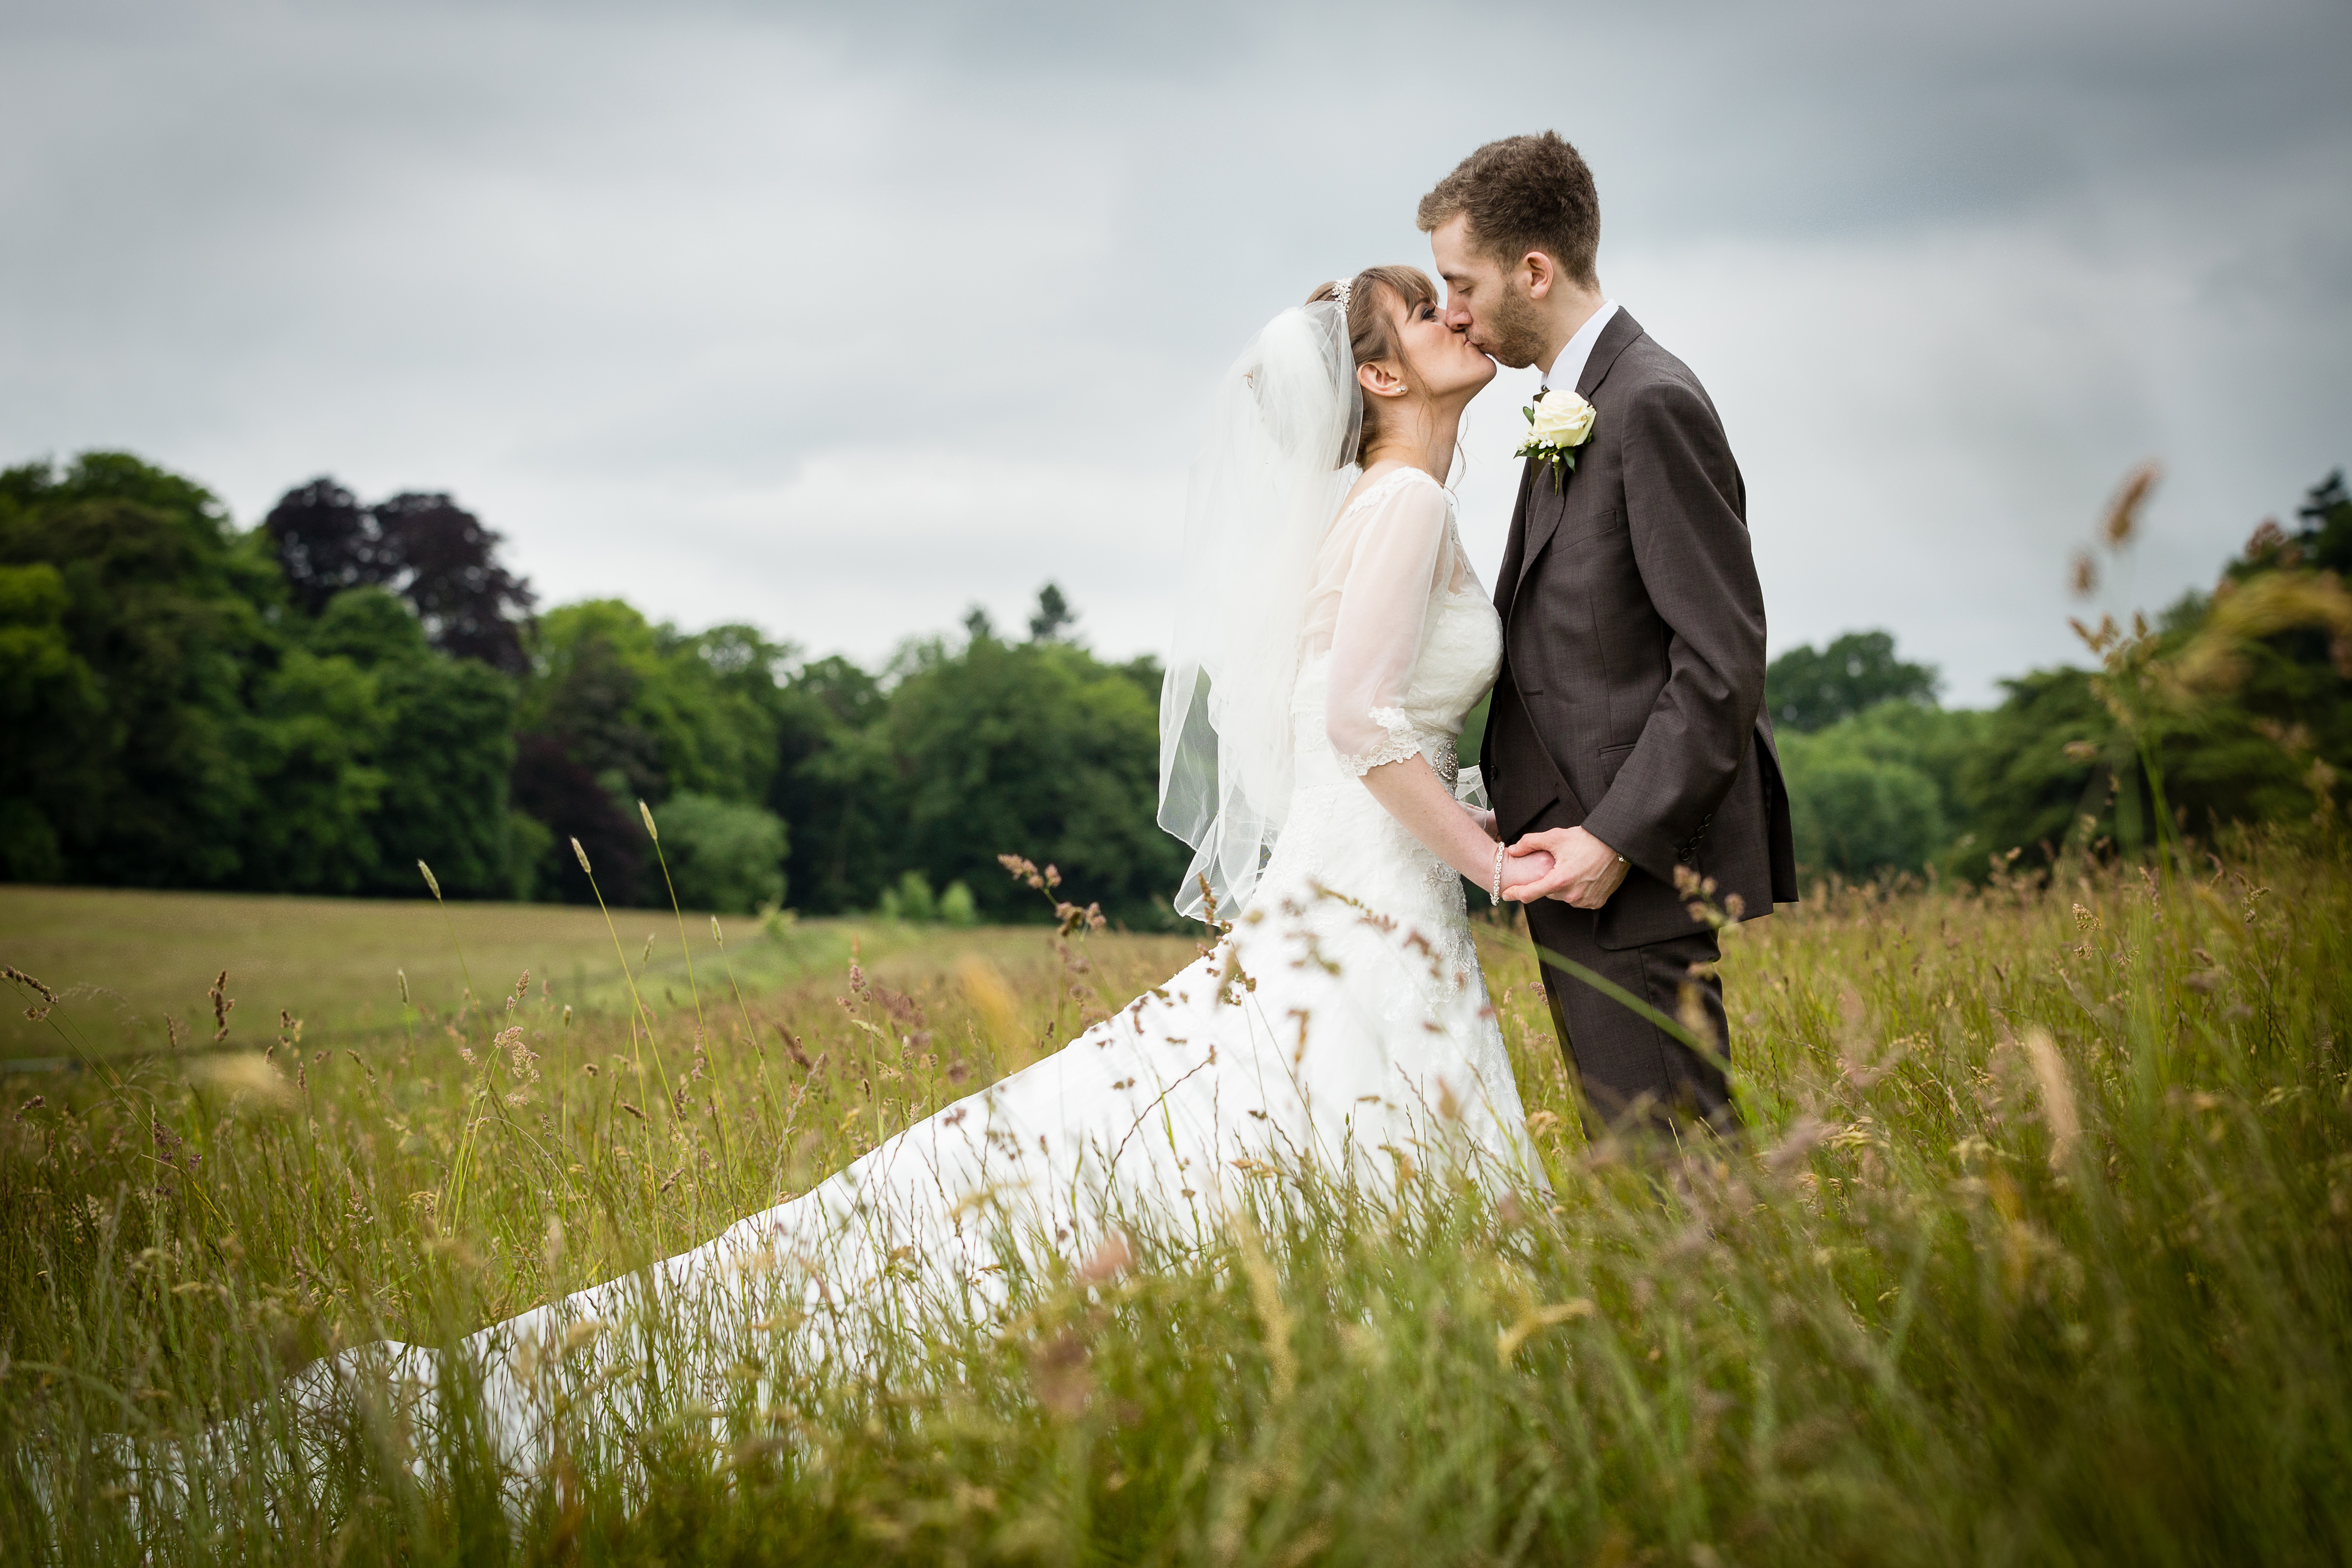 Jessica and Johnny's Heron's Farm wedding